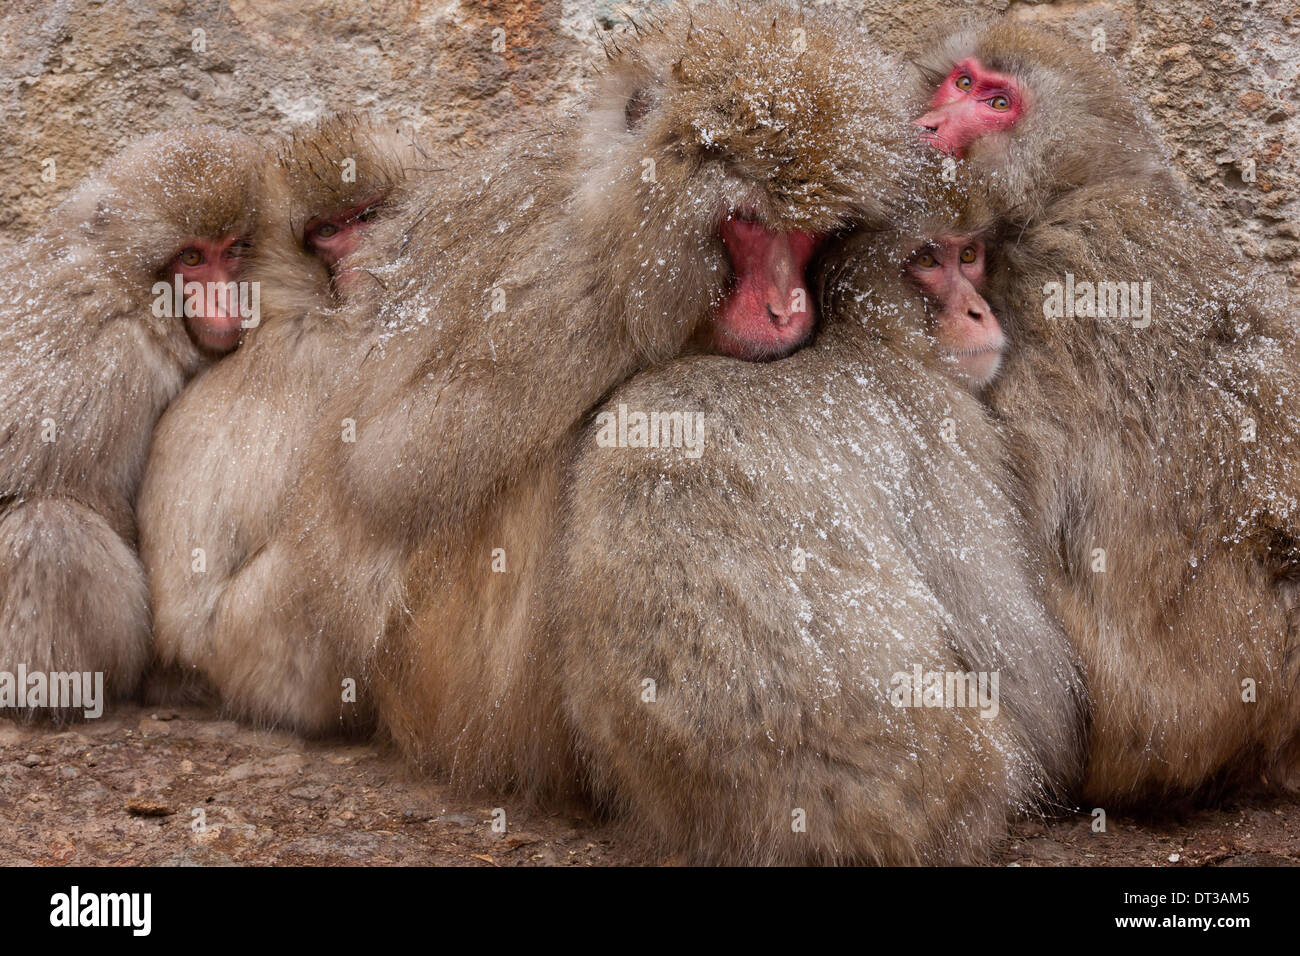 Japanese Macaques, Japanese Alps, Honshu Island, Japan - Stock Image